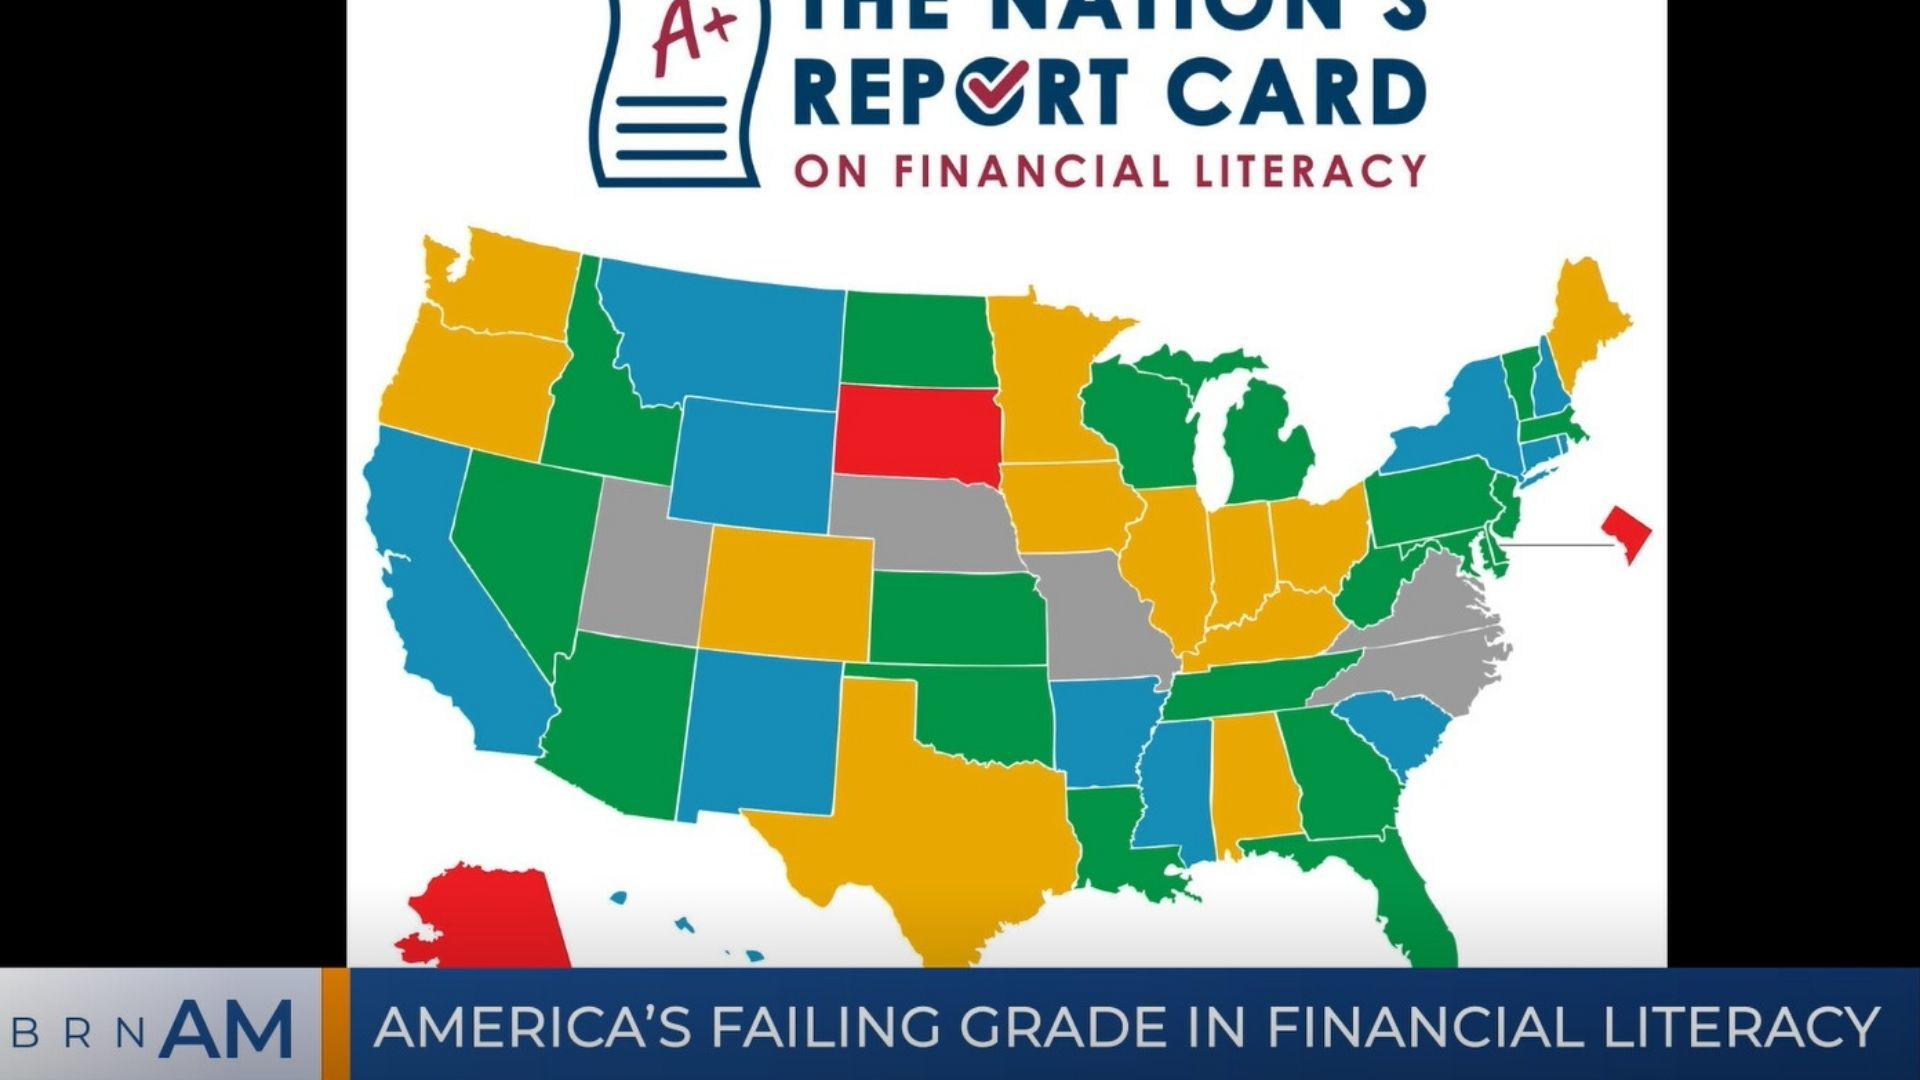 BRN AM | America's failing grade in Financial Literacy